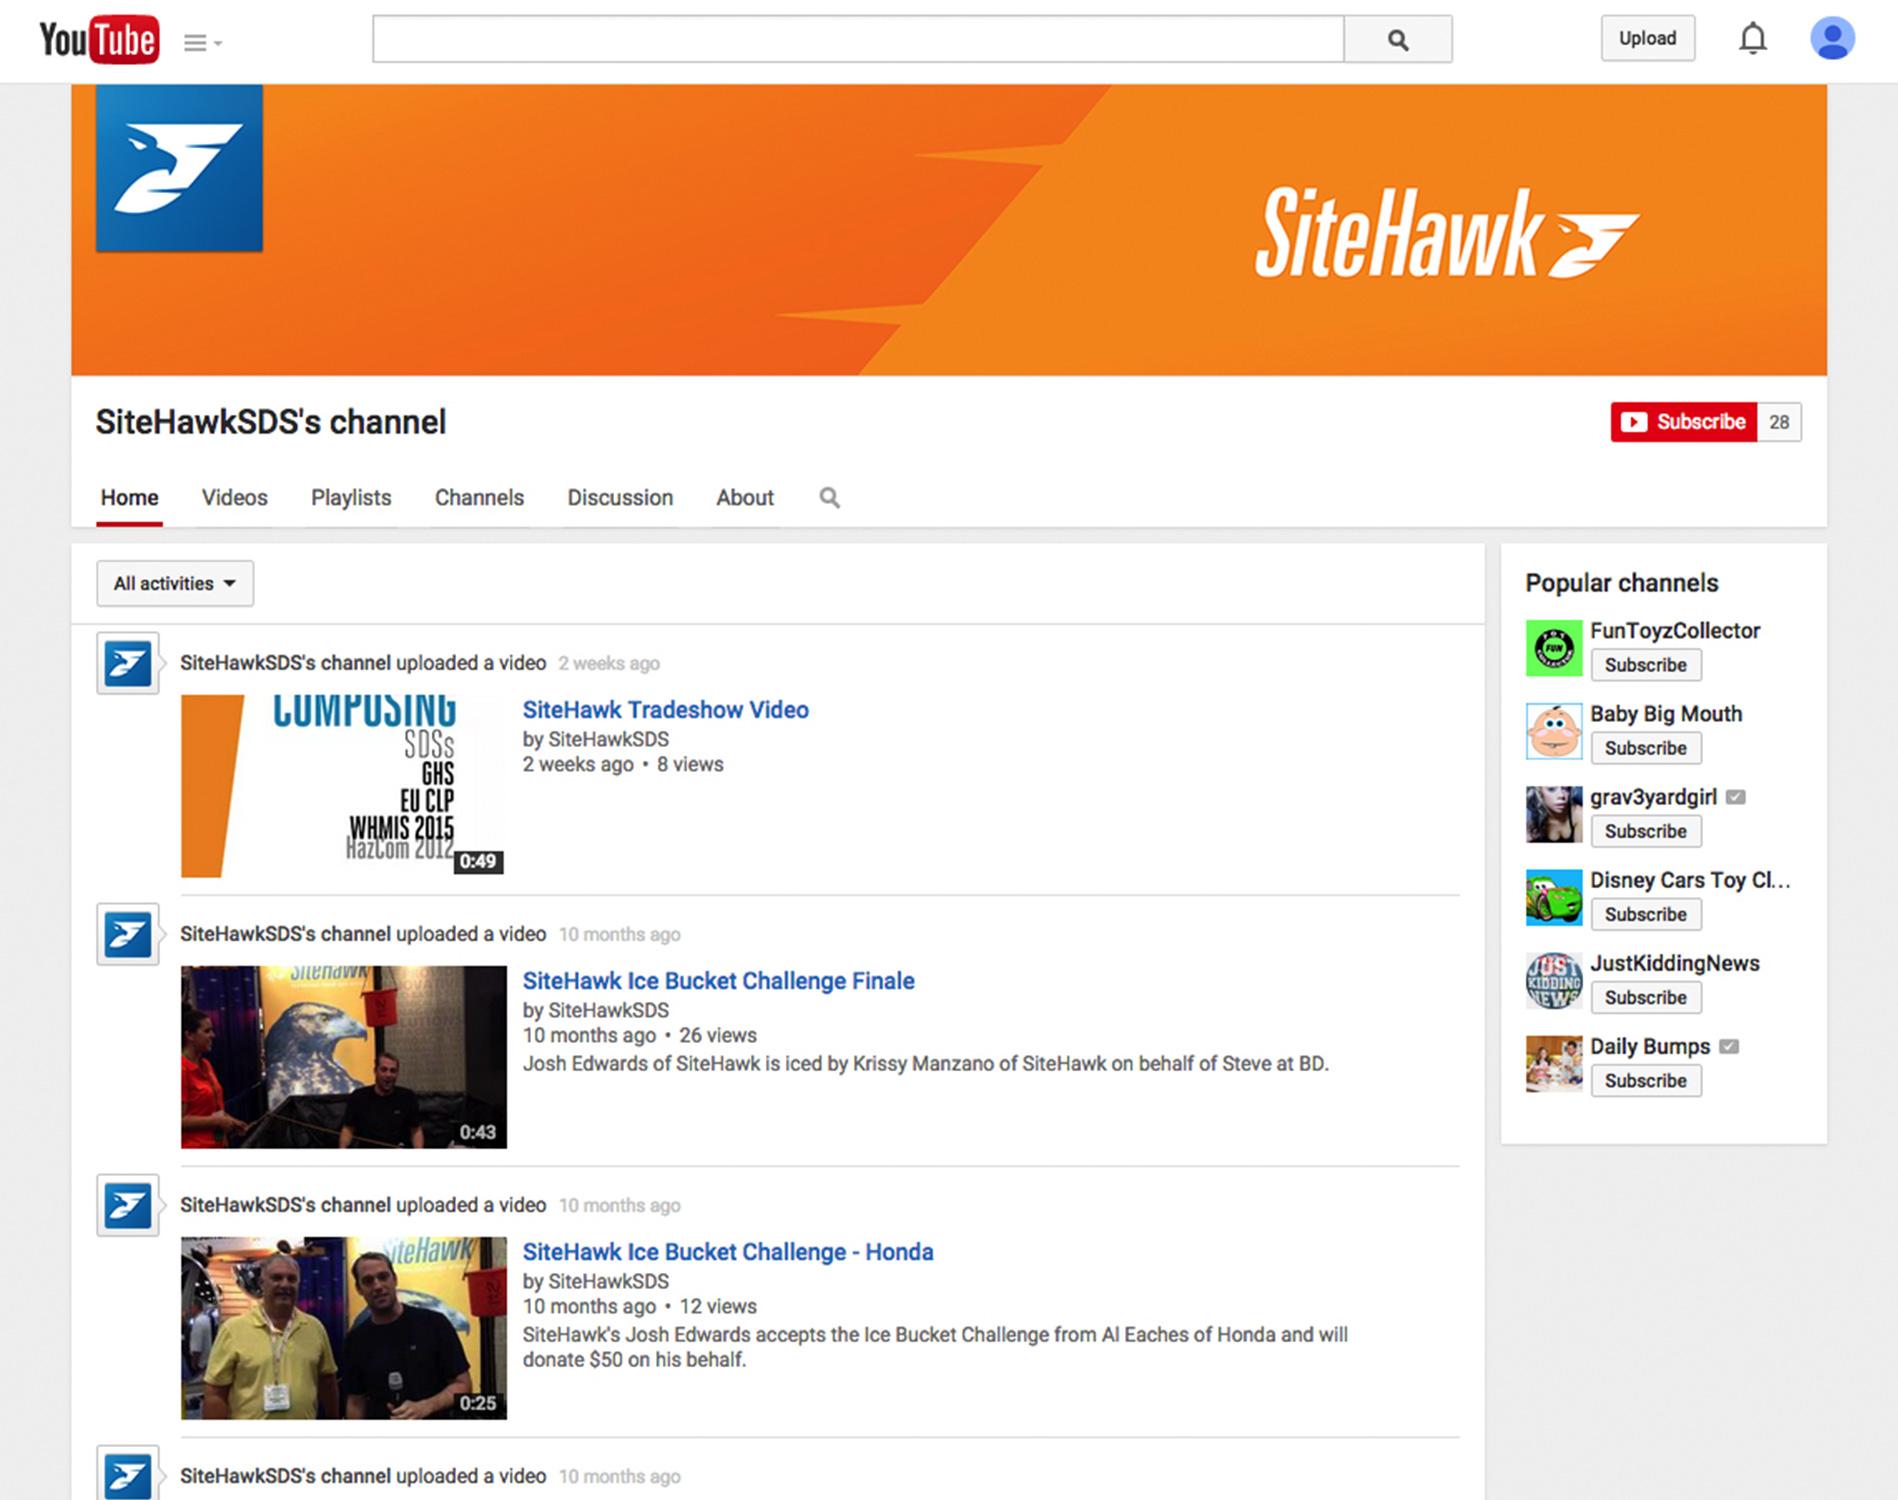 WEBSITE_SHAWK_Youtube